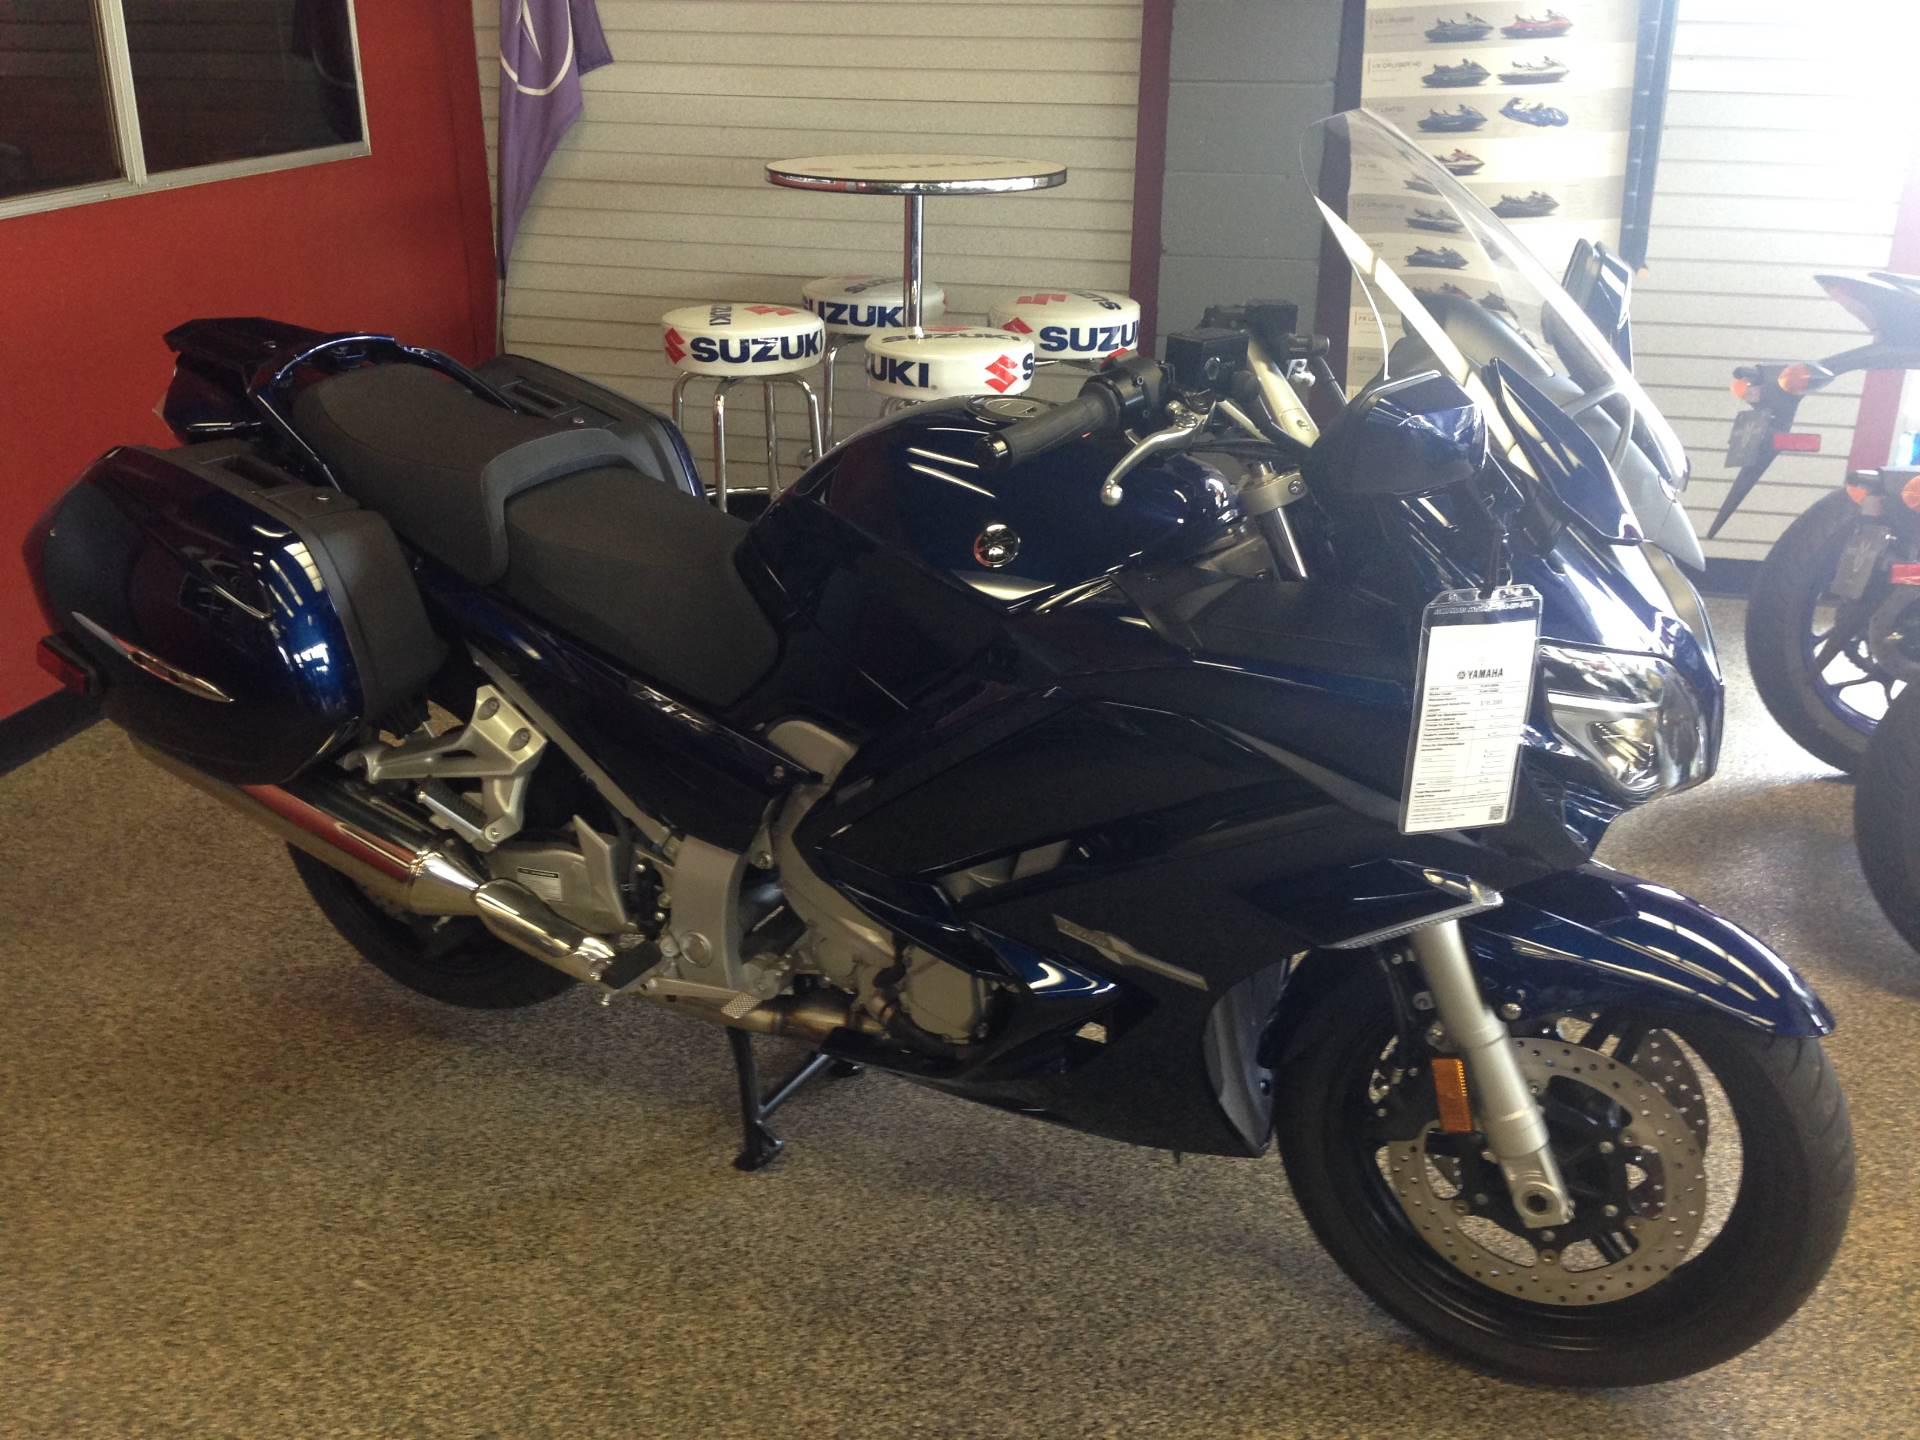 2016 Yamaha FJR1300A 1